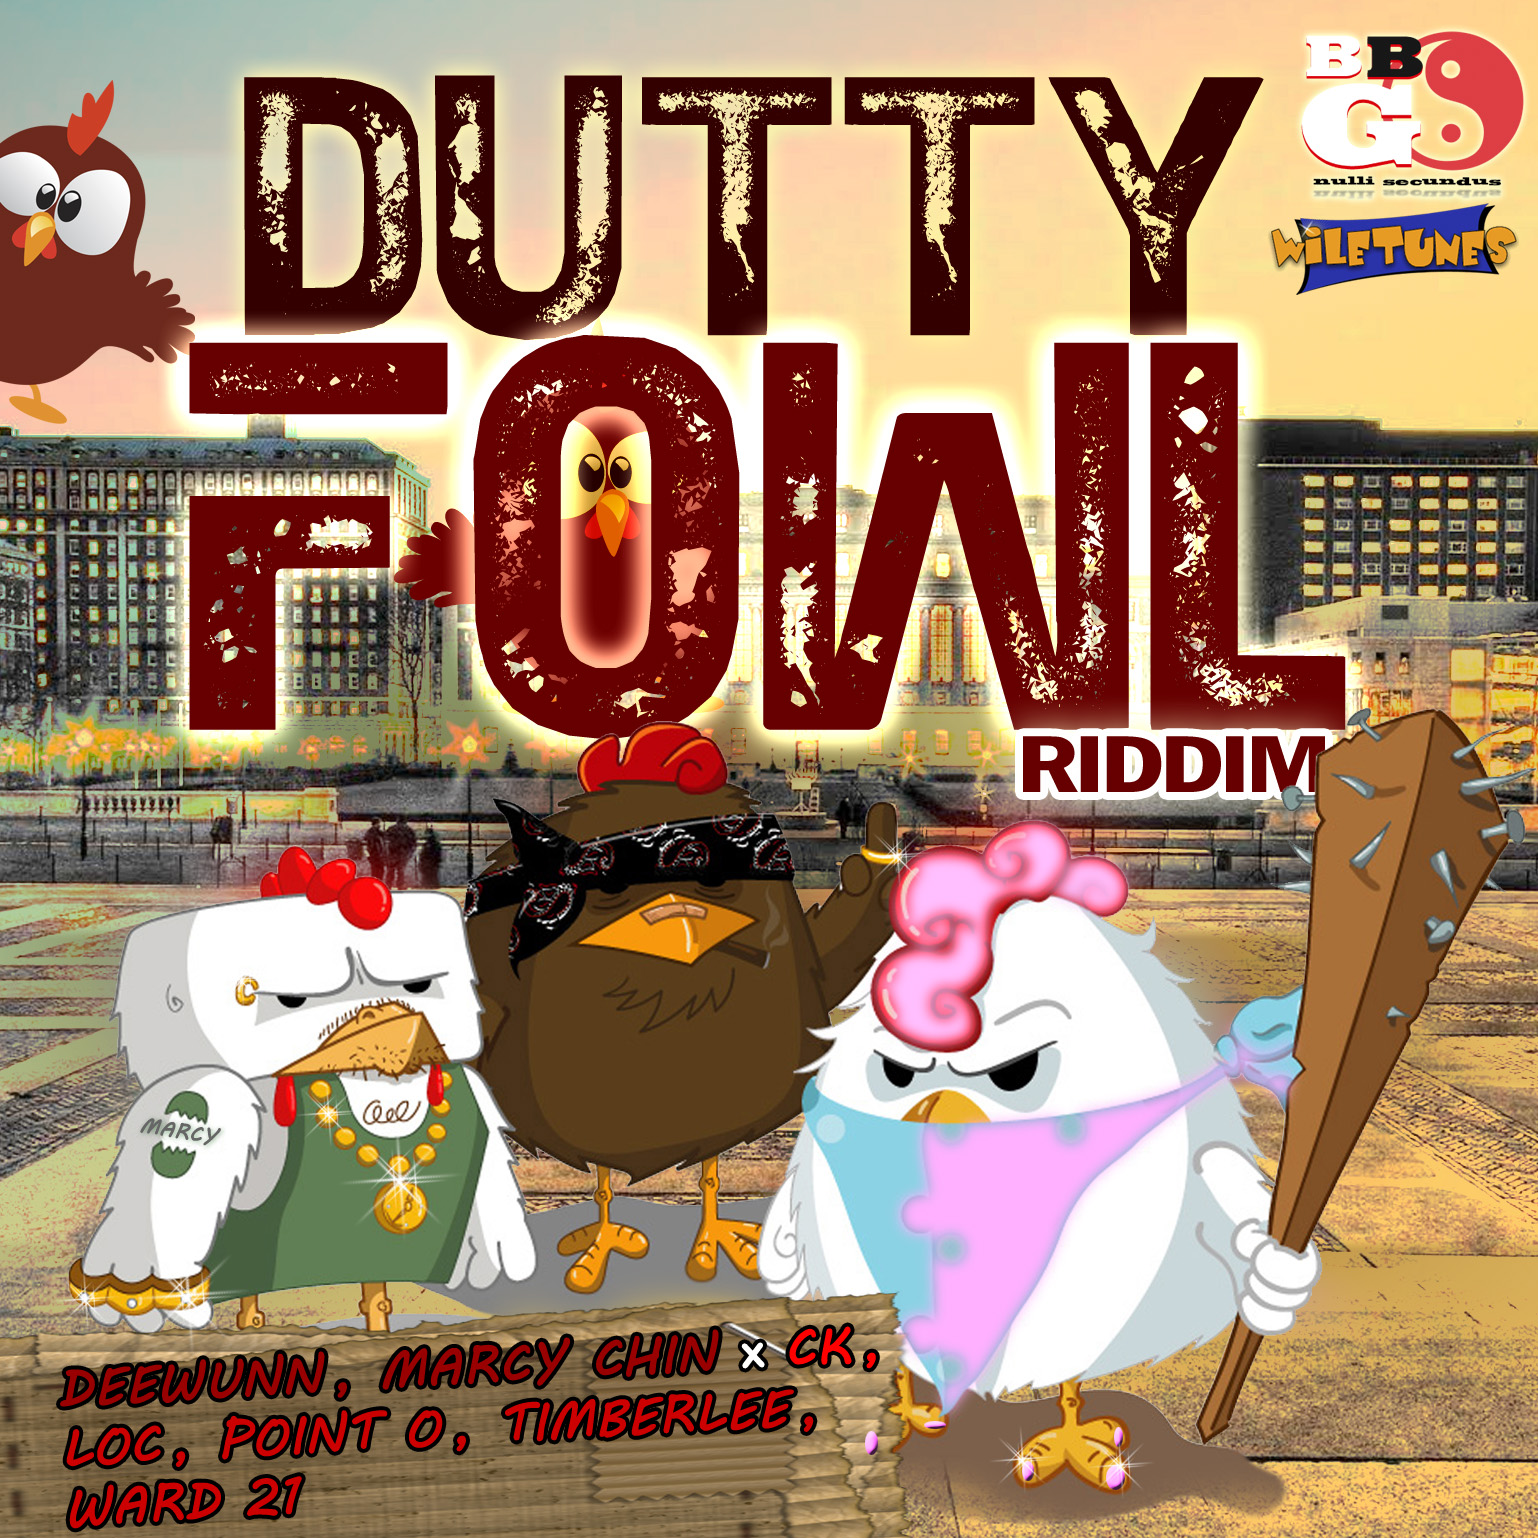 dutty-fowl-riddim-wiletunes-cover